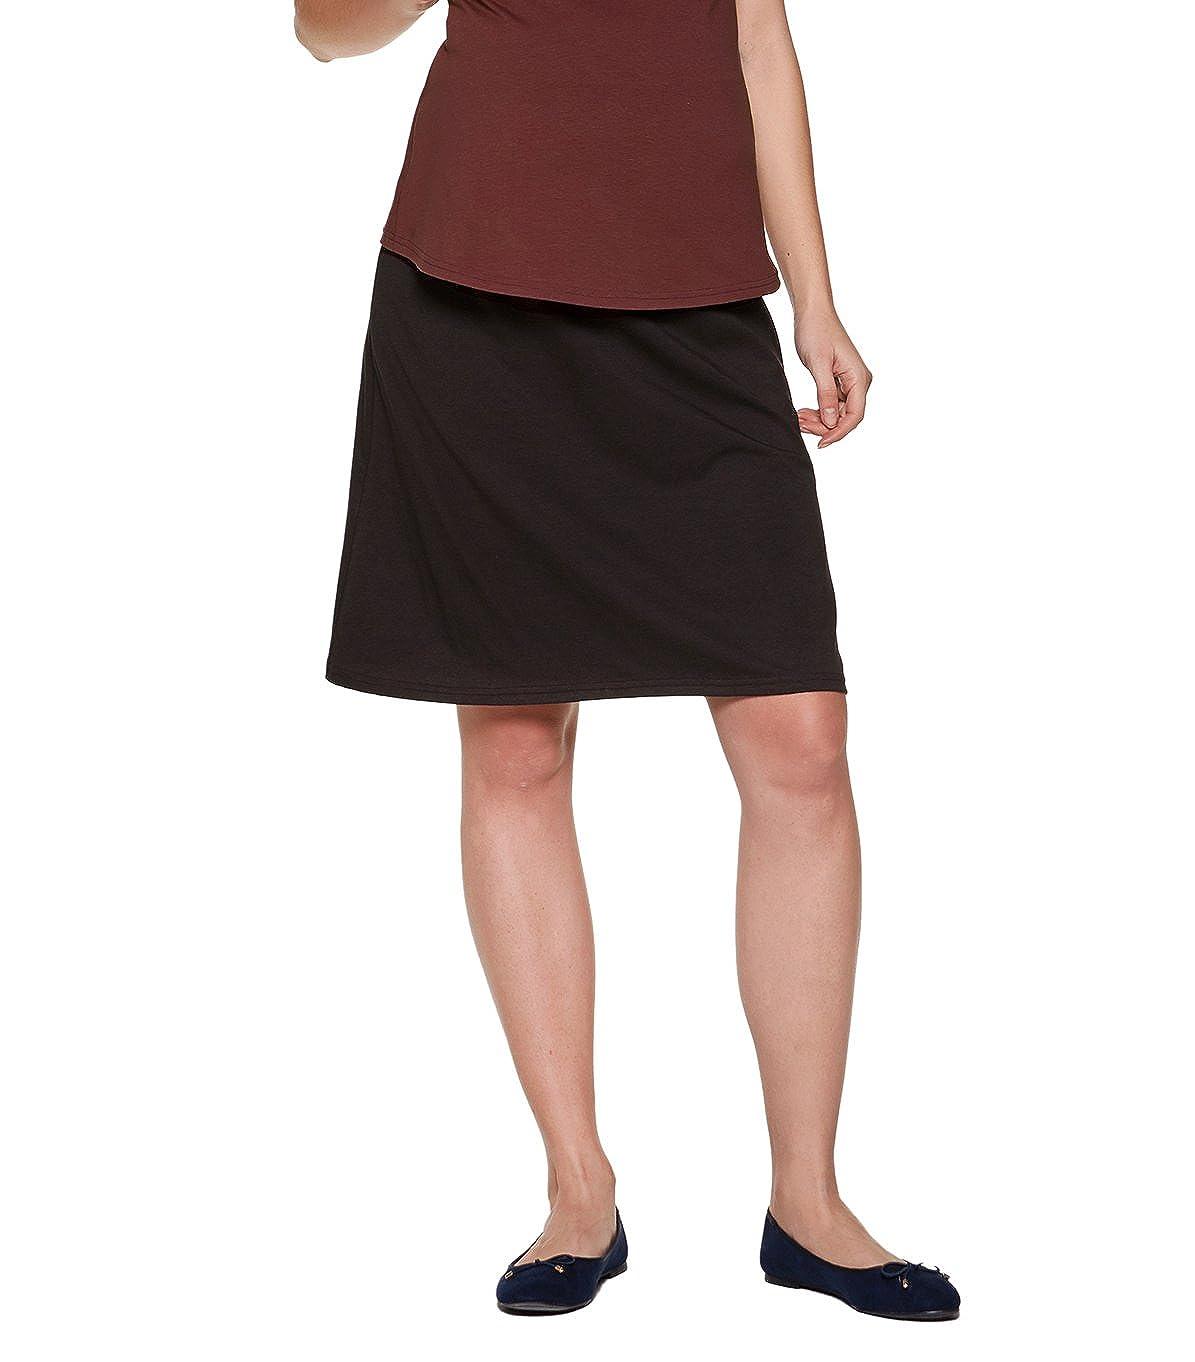 Modell BASIC Mama Umstandsrock aus Baumwolle Be